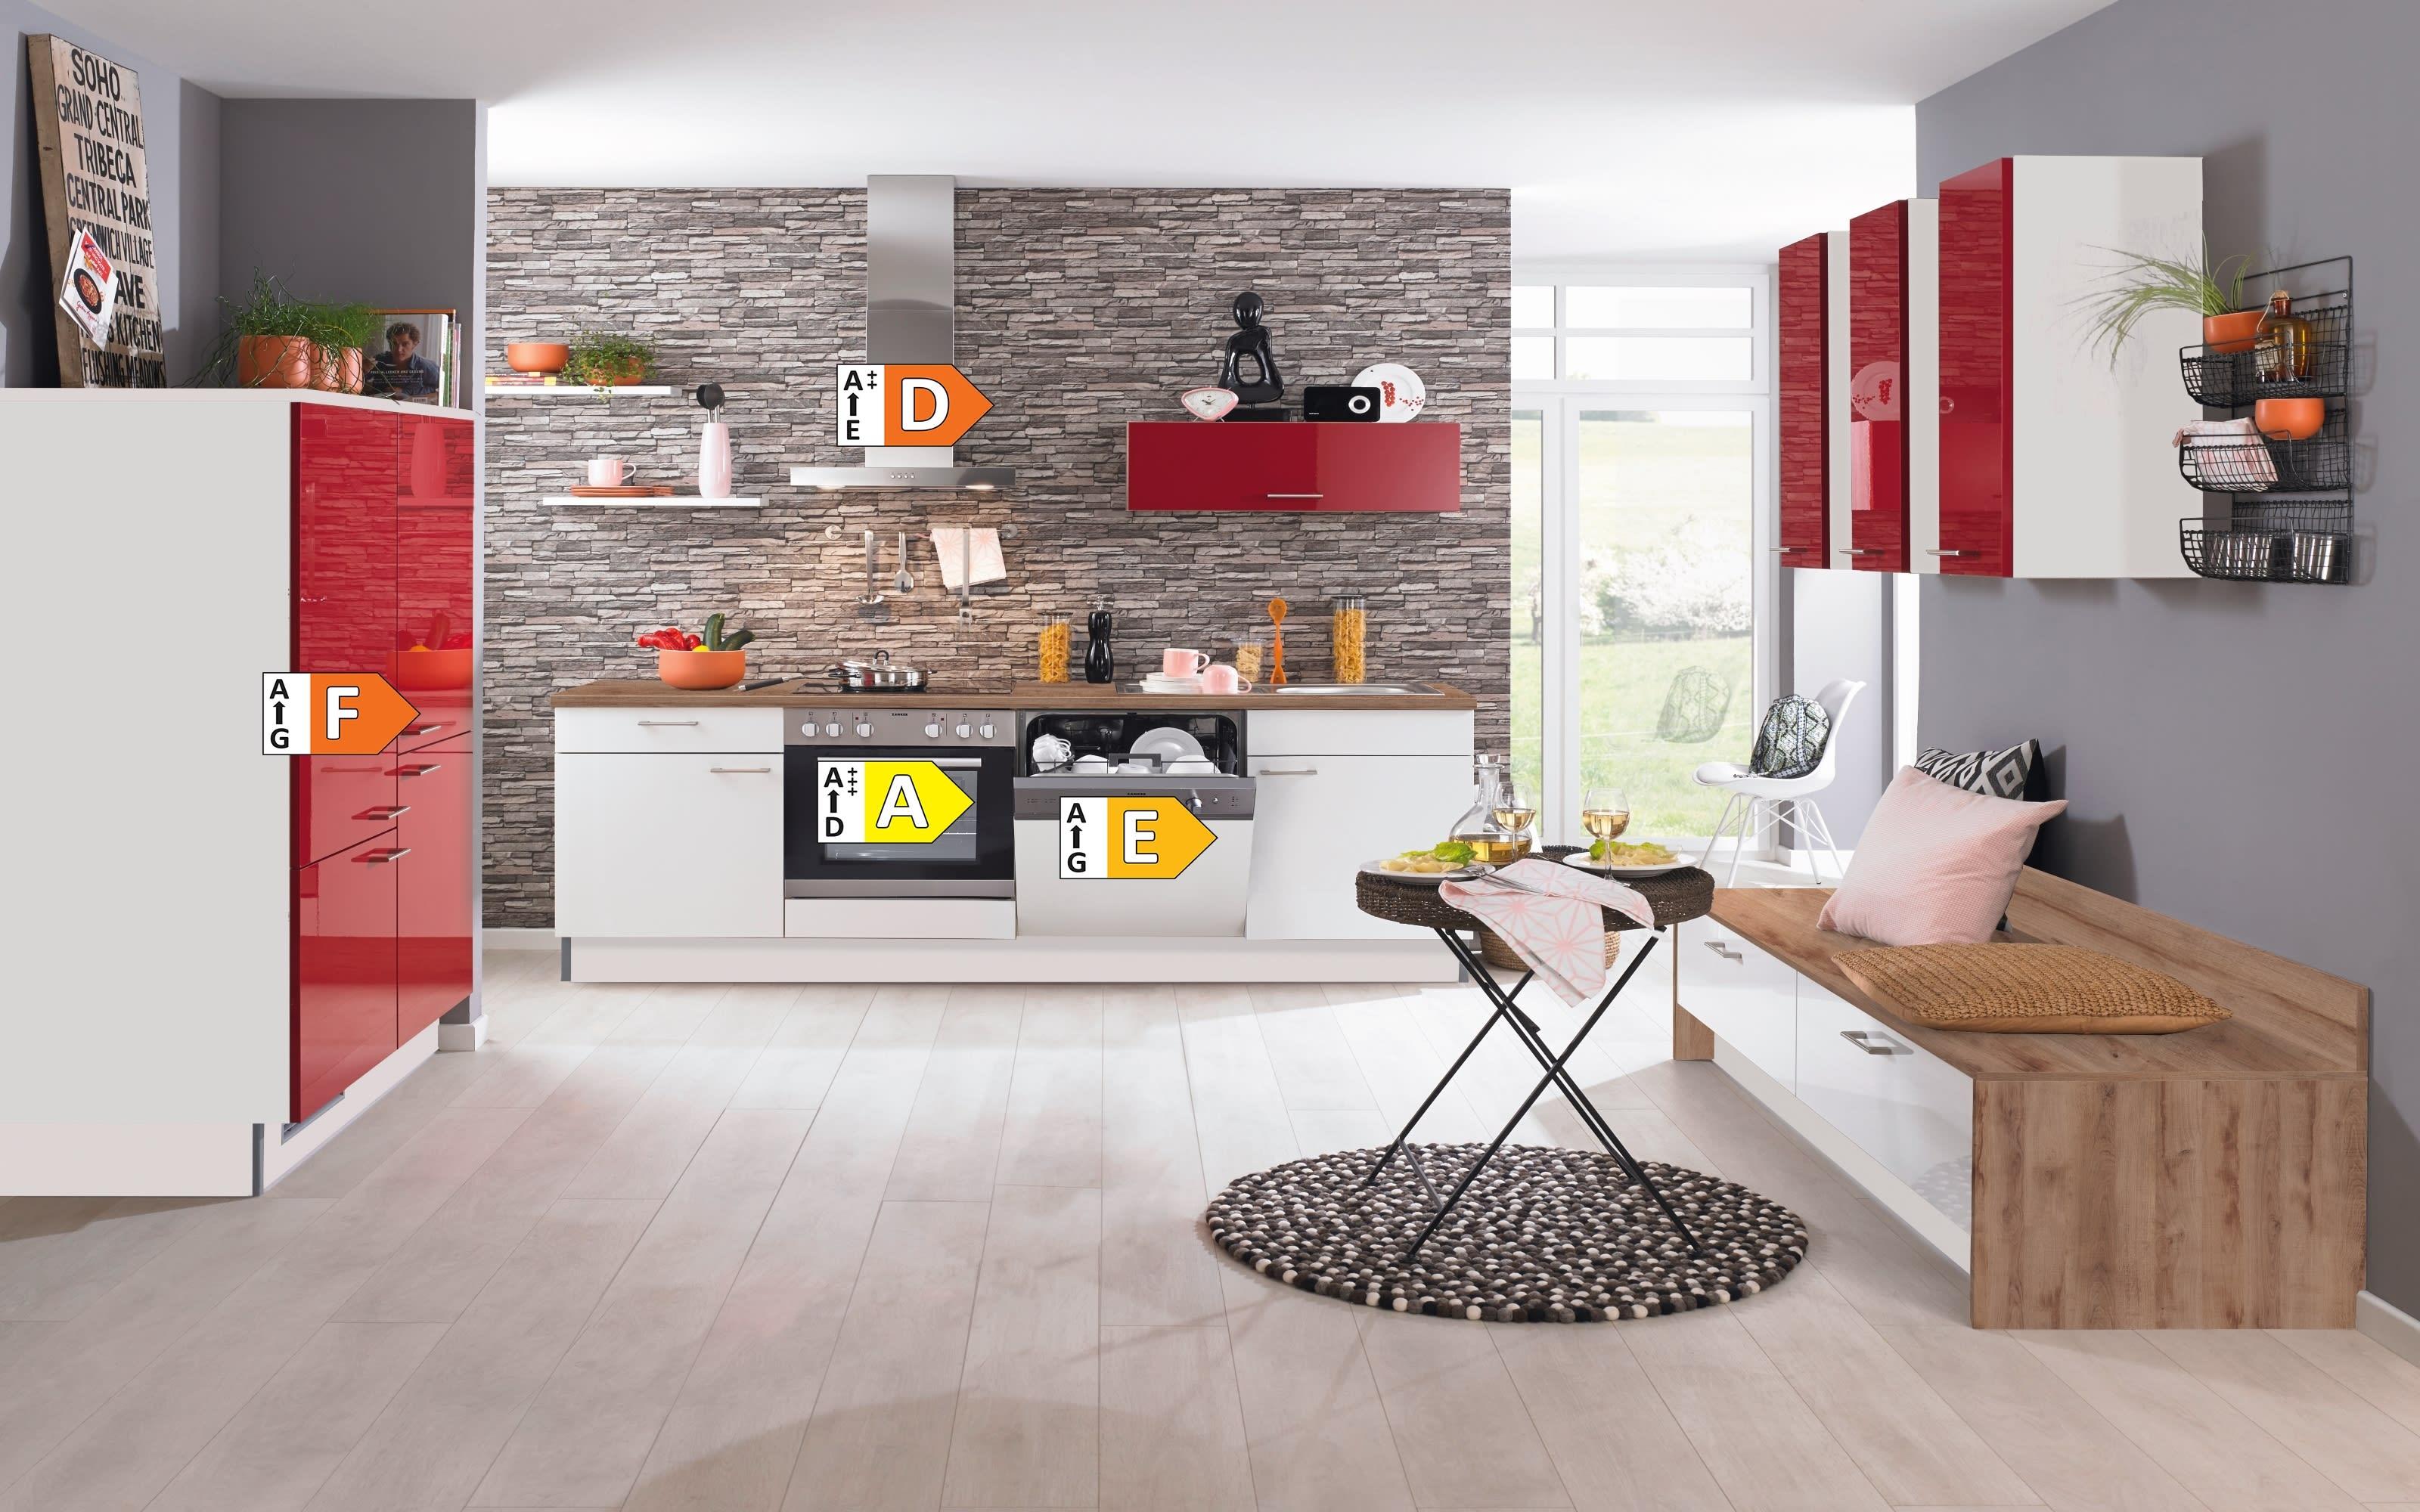 Einbauküche PN270, weiß/rot, inklusive Elektrogeräte, inklusive AEG Geschirrspüler